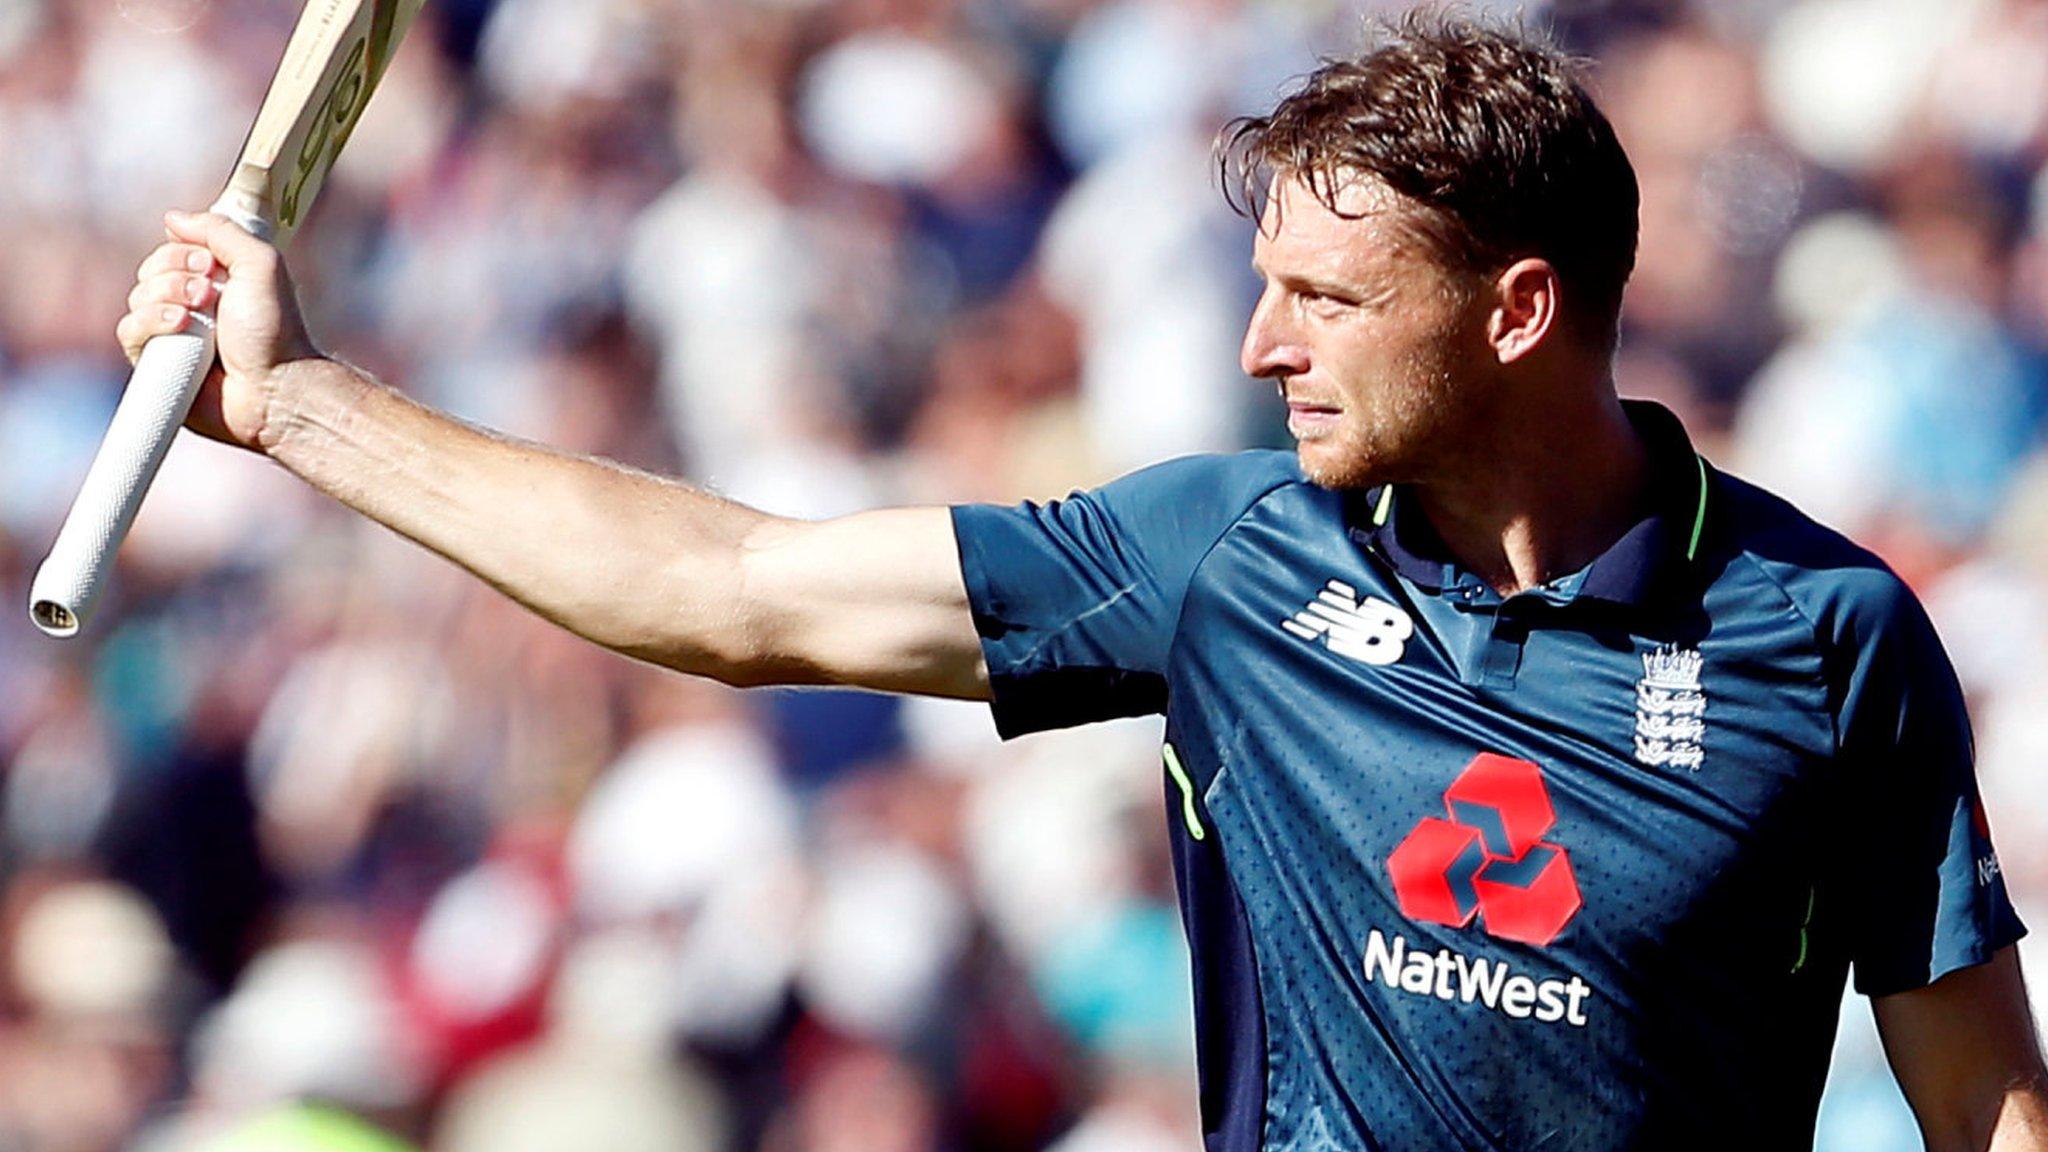 England v Australia: Jos Buttler century secures 5-0 ODI whitewash